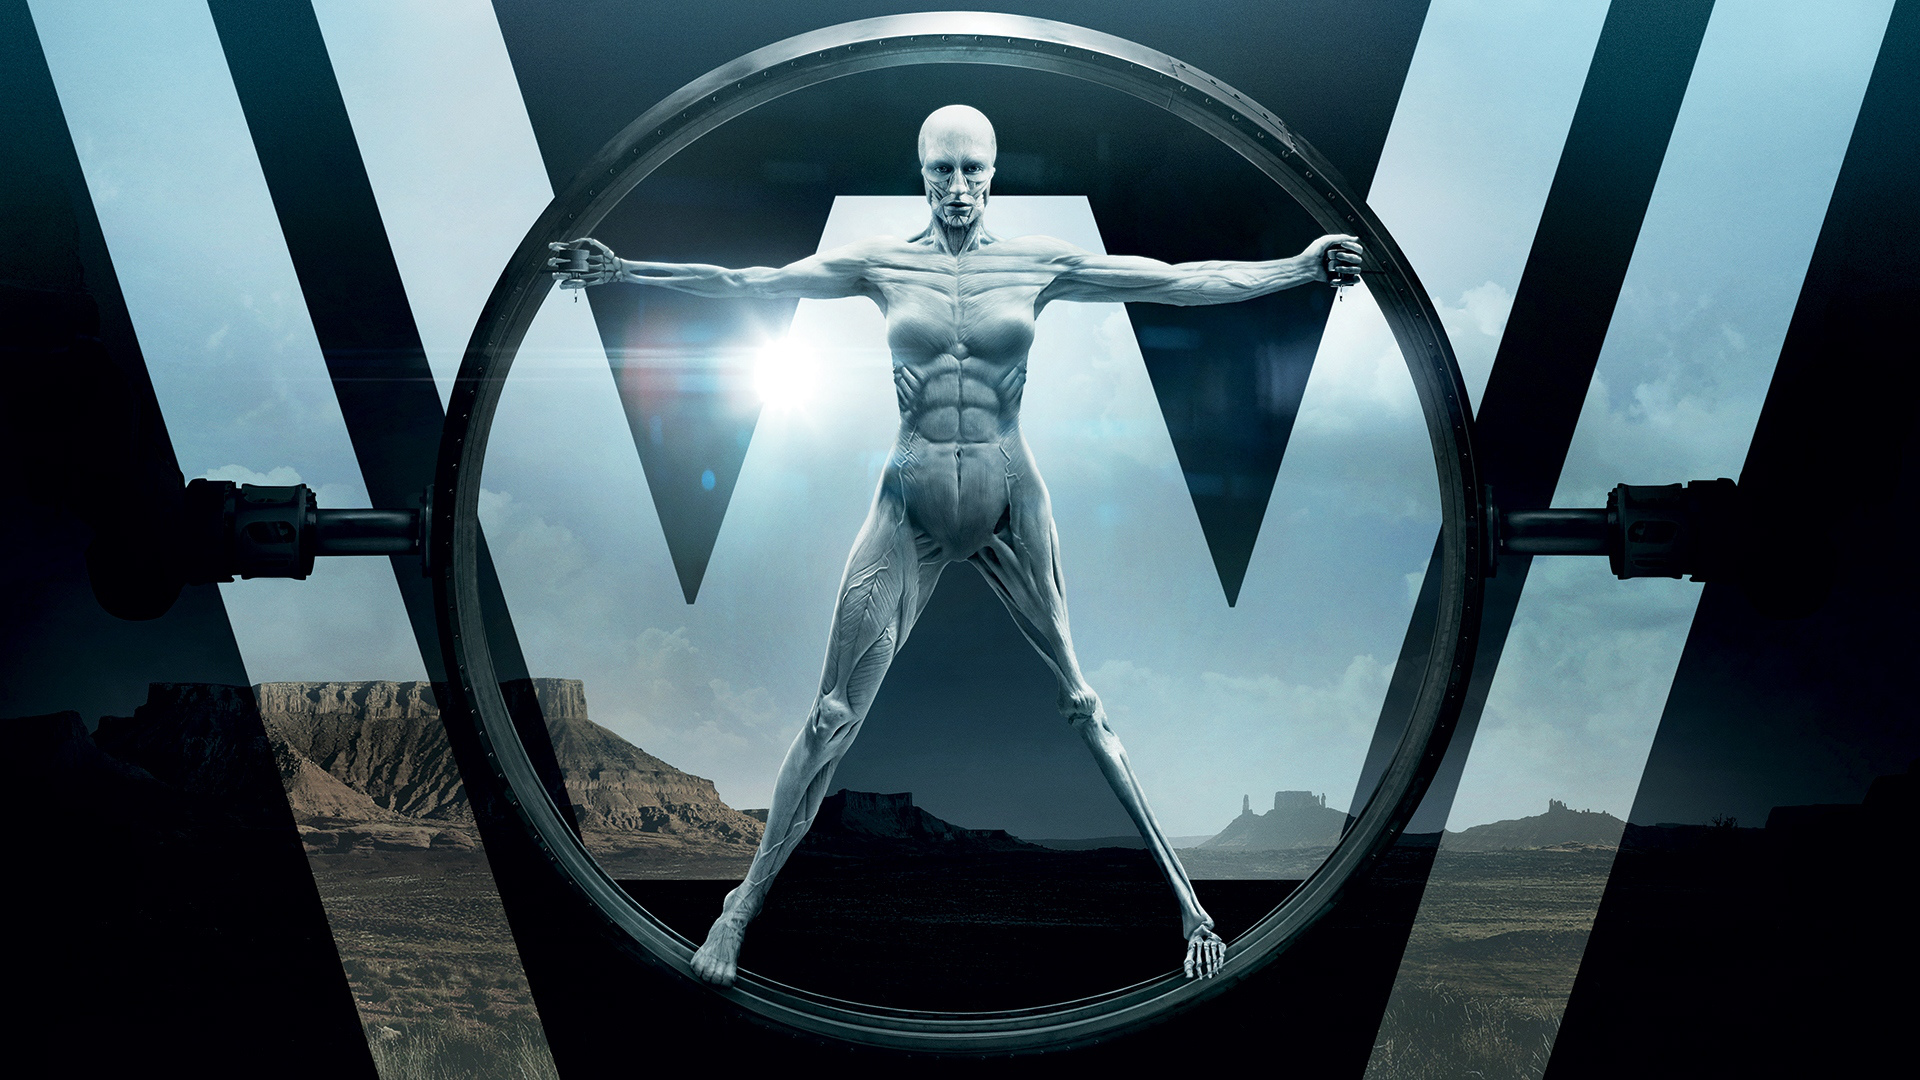 Westworld: Presumed dead character looks set to return in season 2